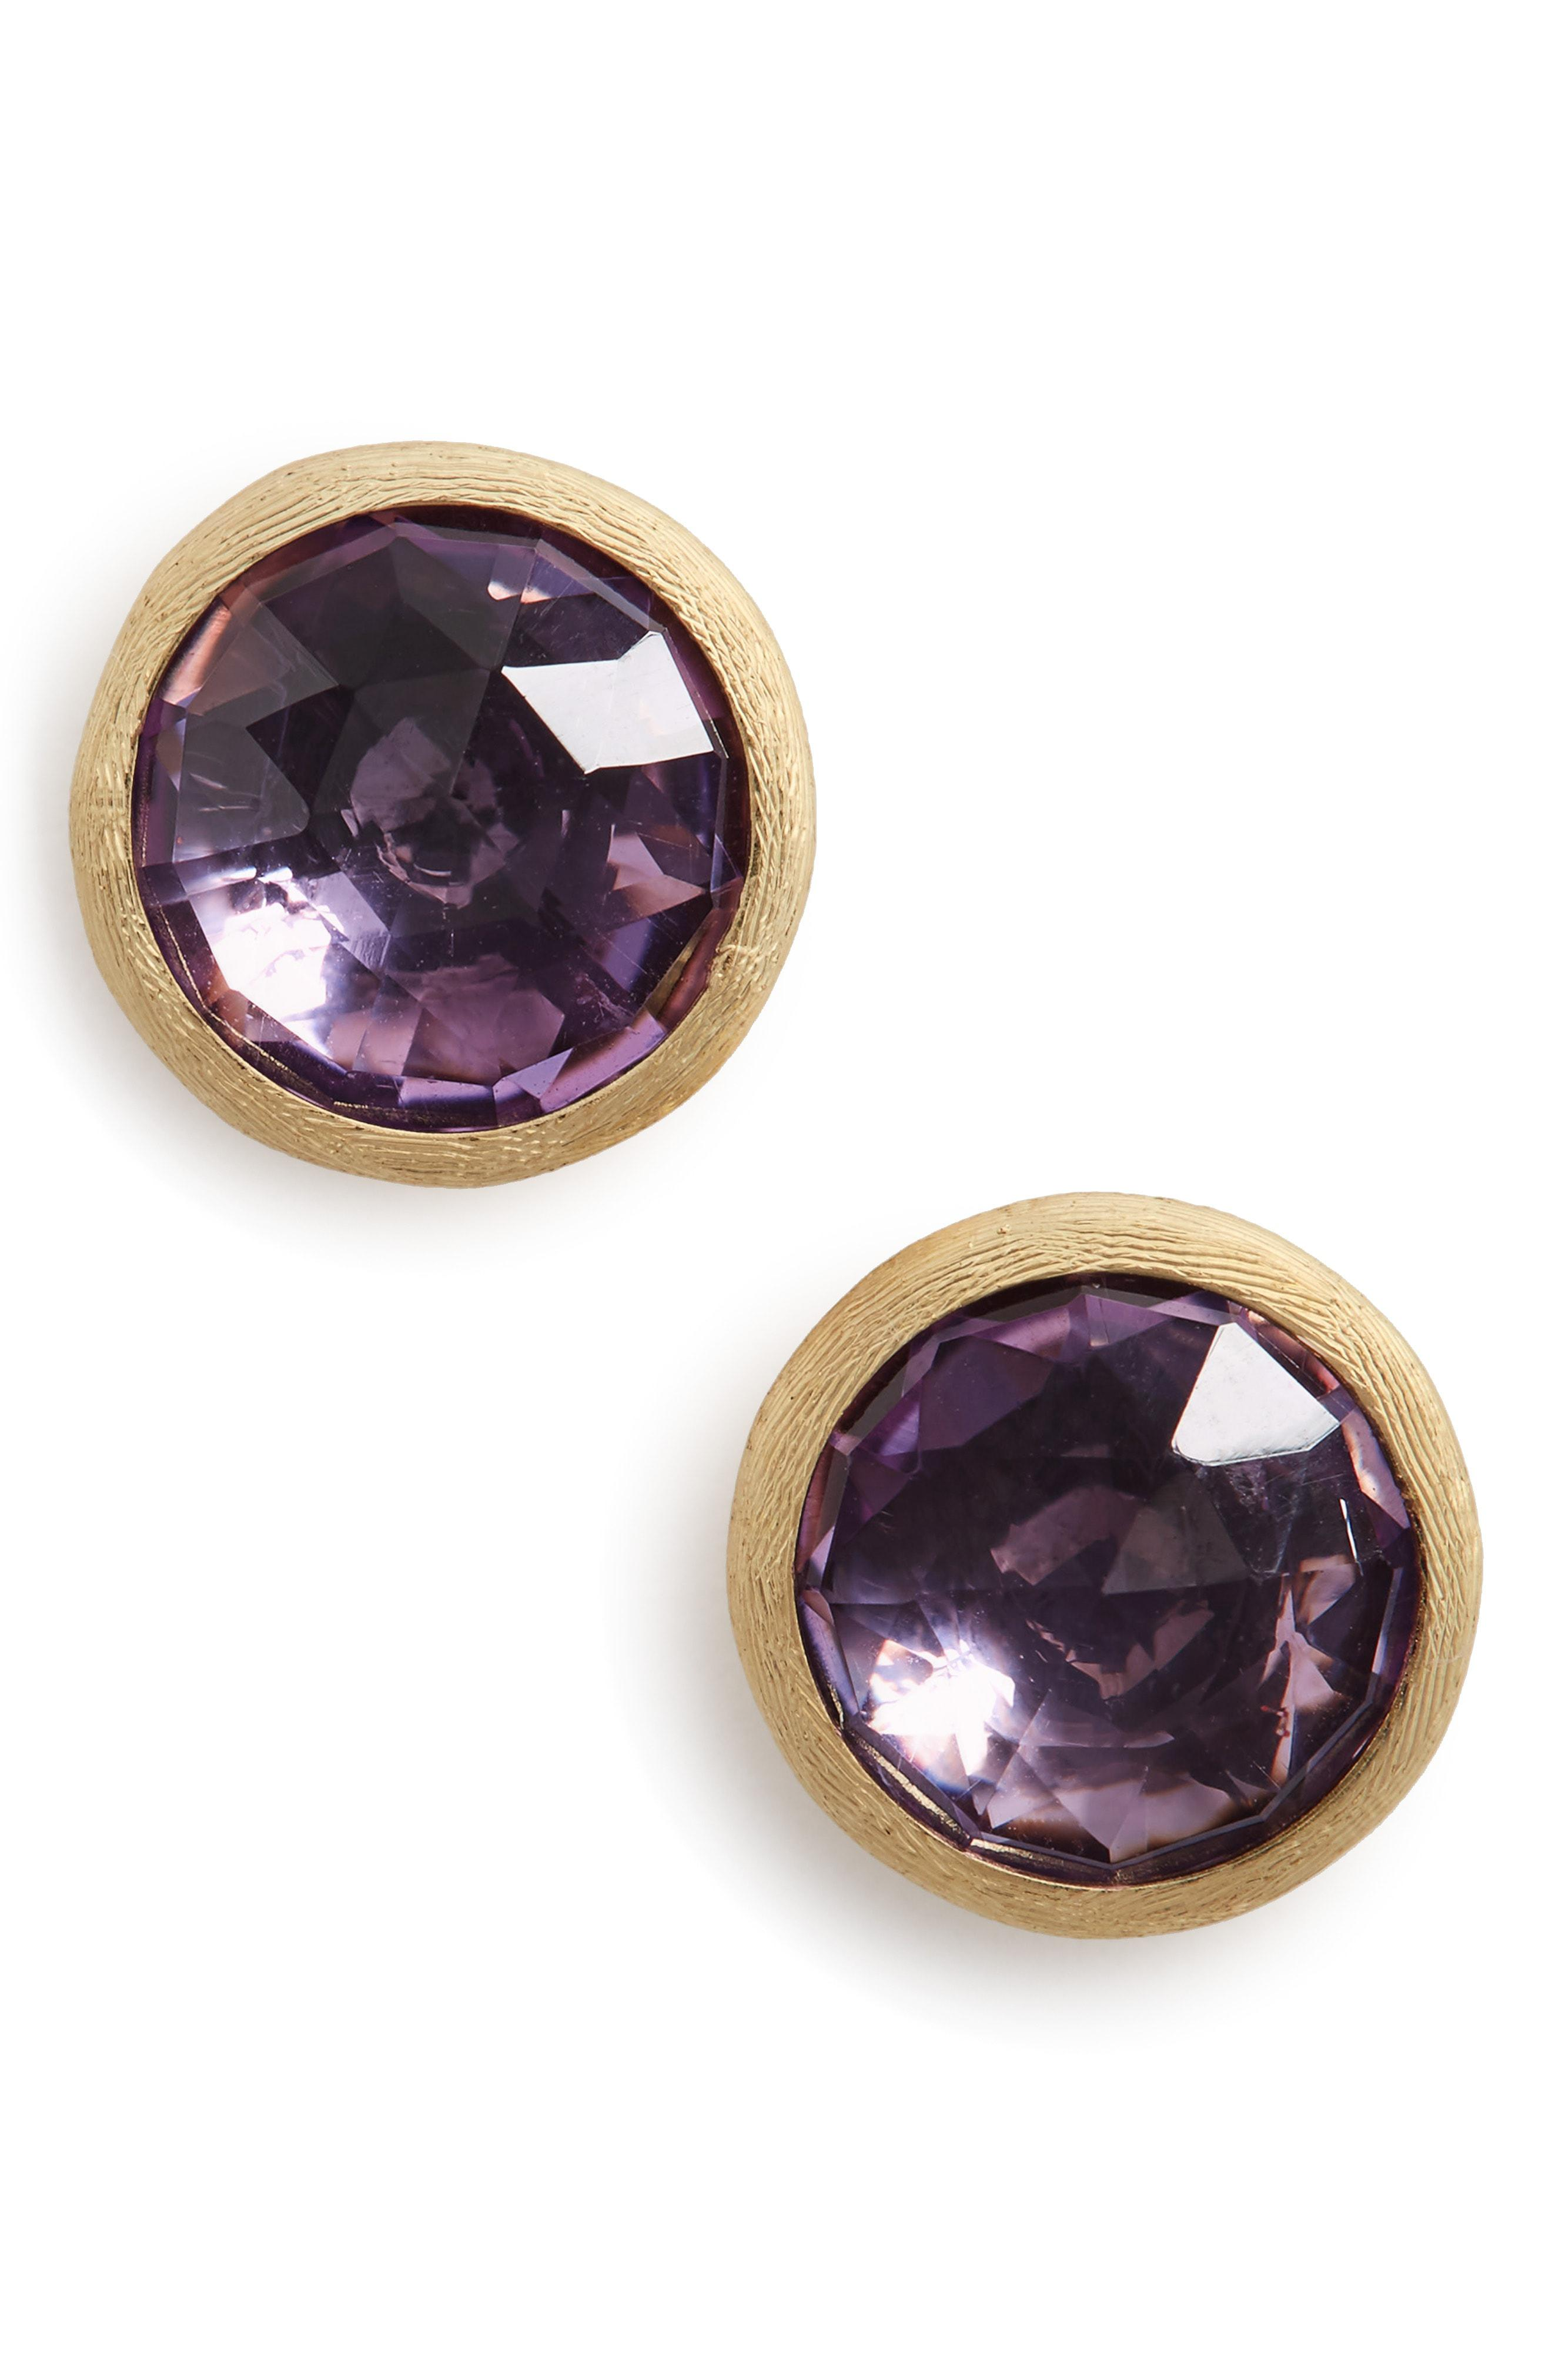 bb269d1f6ddd Lyst - Marco Bicego  jaipur  Stone Stud Earrings in Purple - Save 20.0%